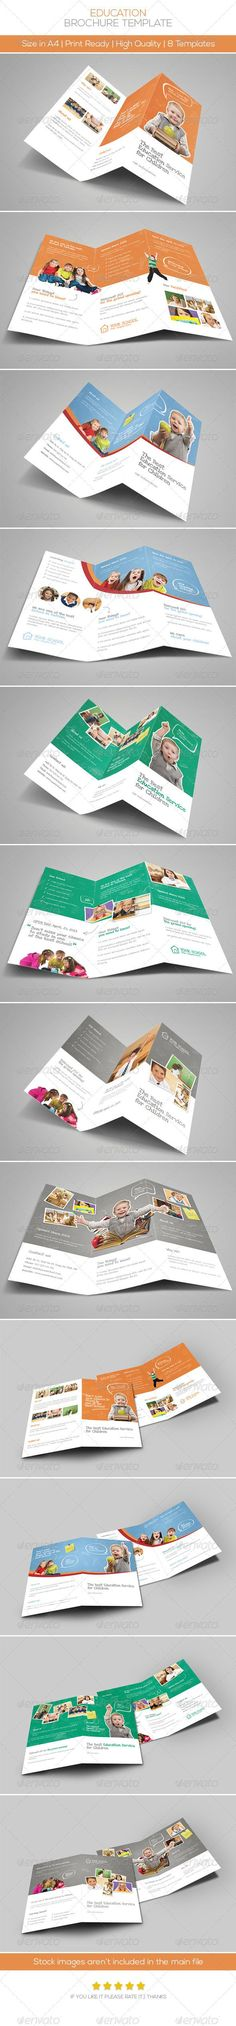 Premium Education Brochure Tri-fold